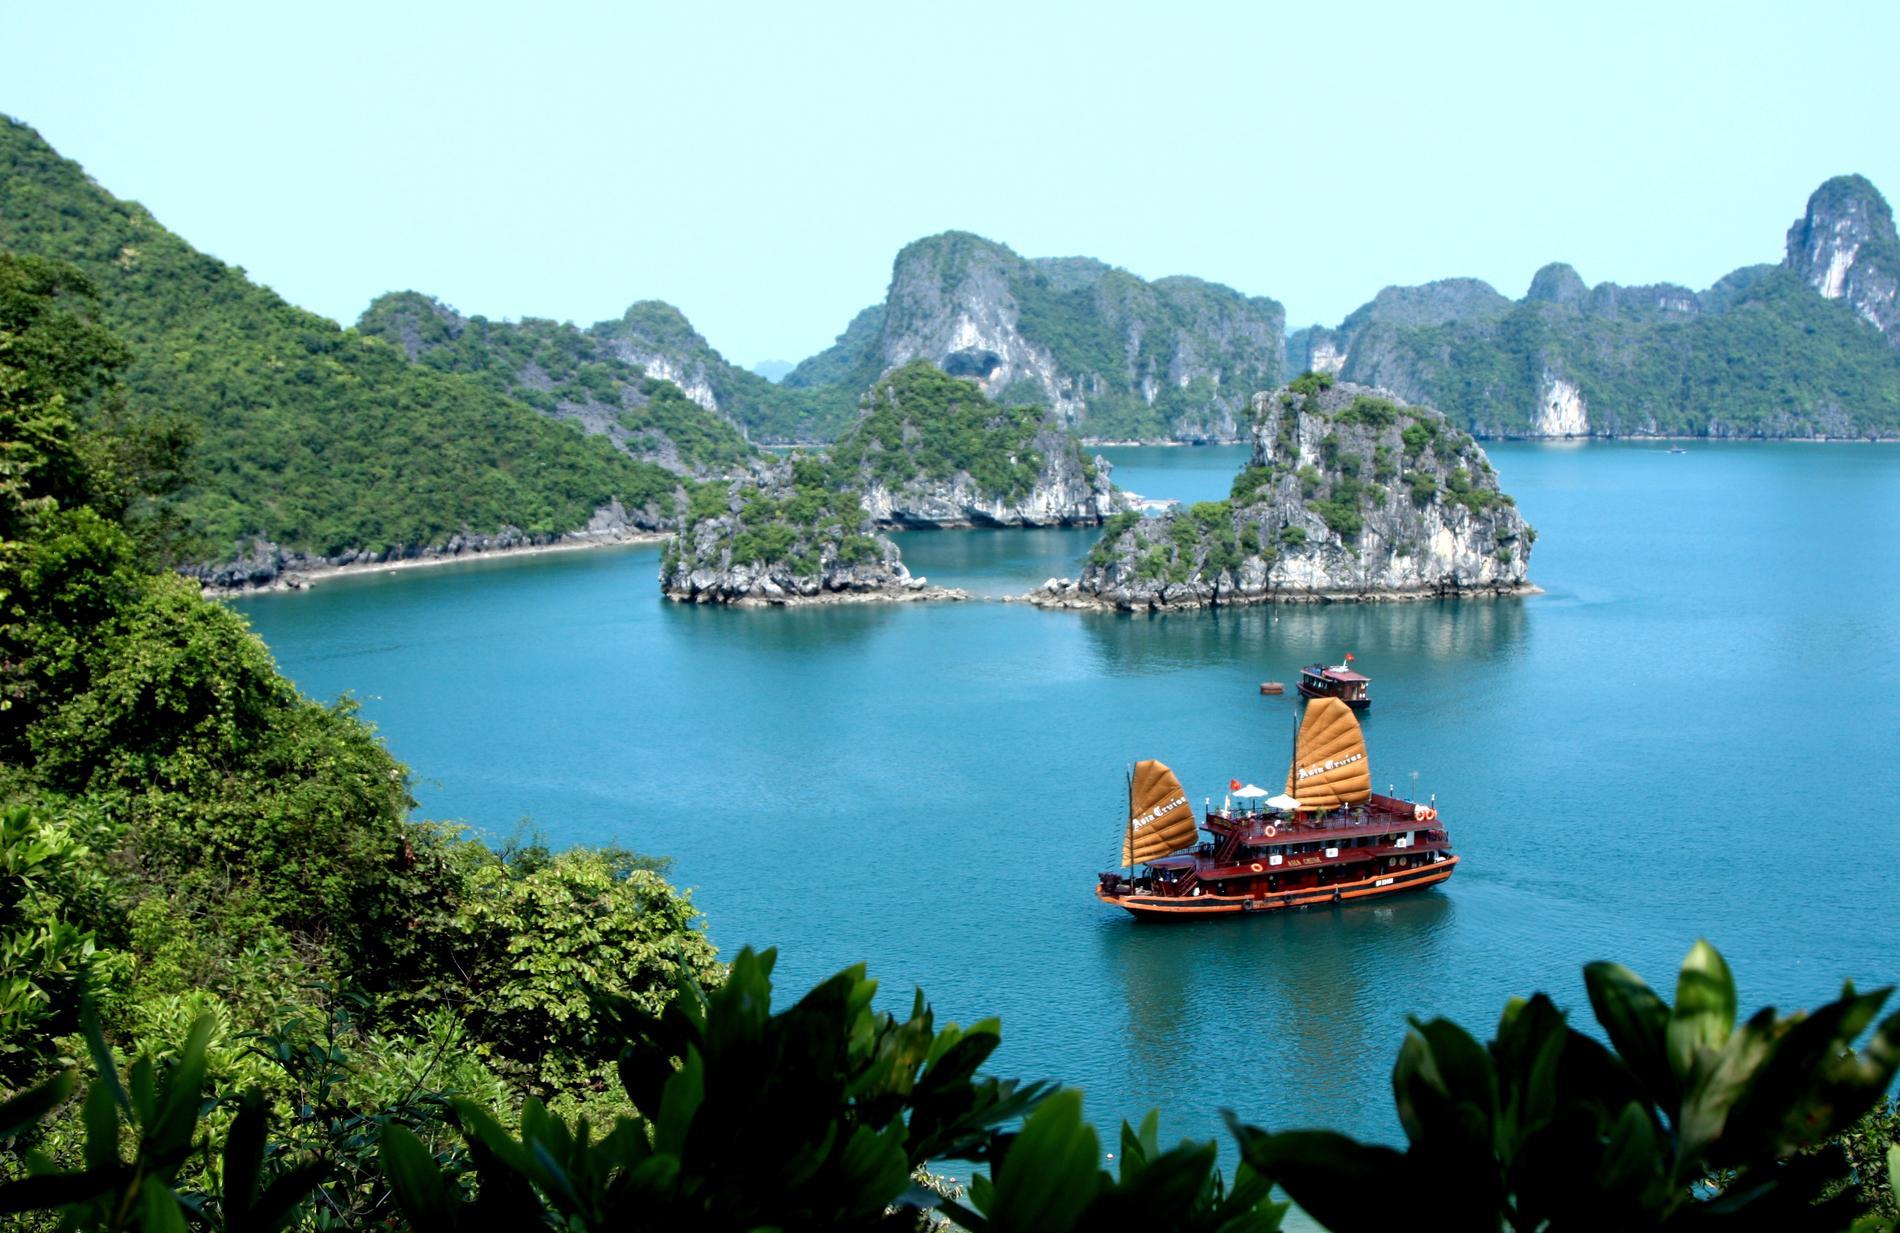 Den nedstigande drakens bukt ligger i norra Vietnam.